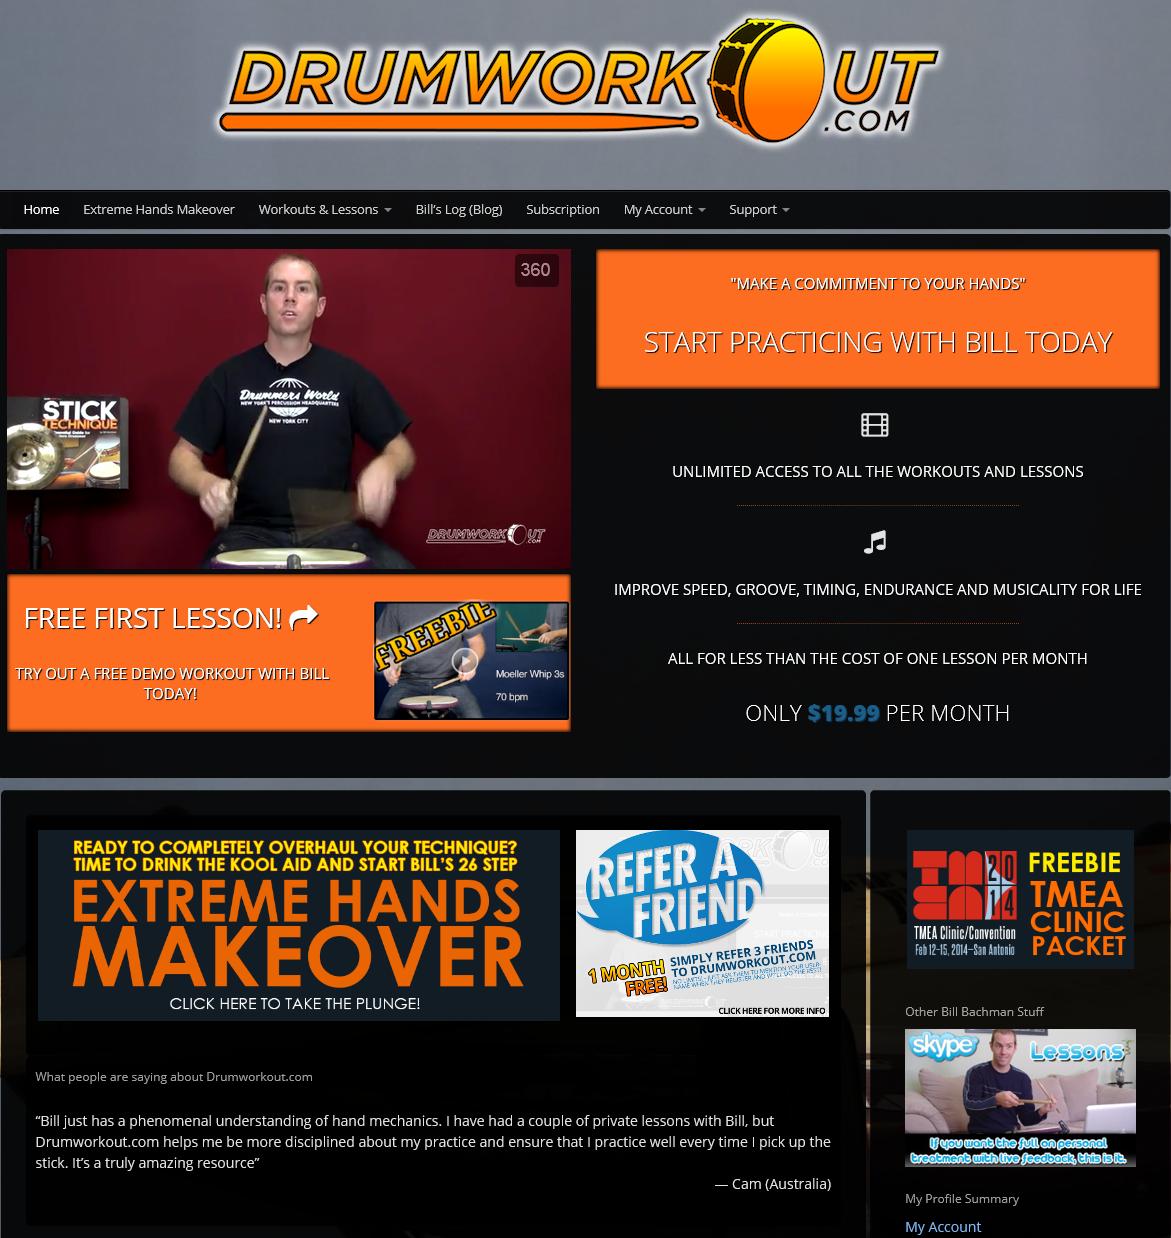 www.drumworkout.com